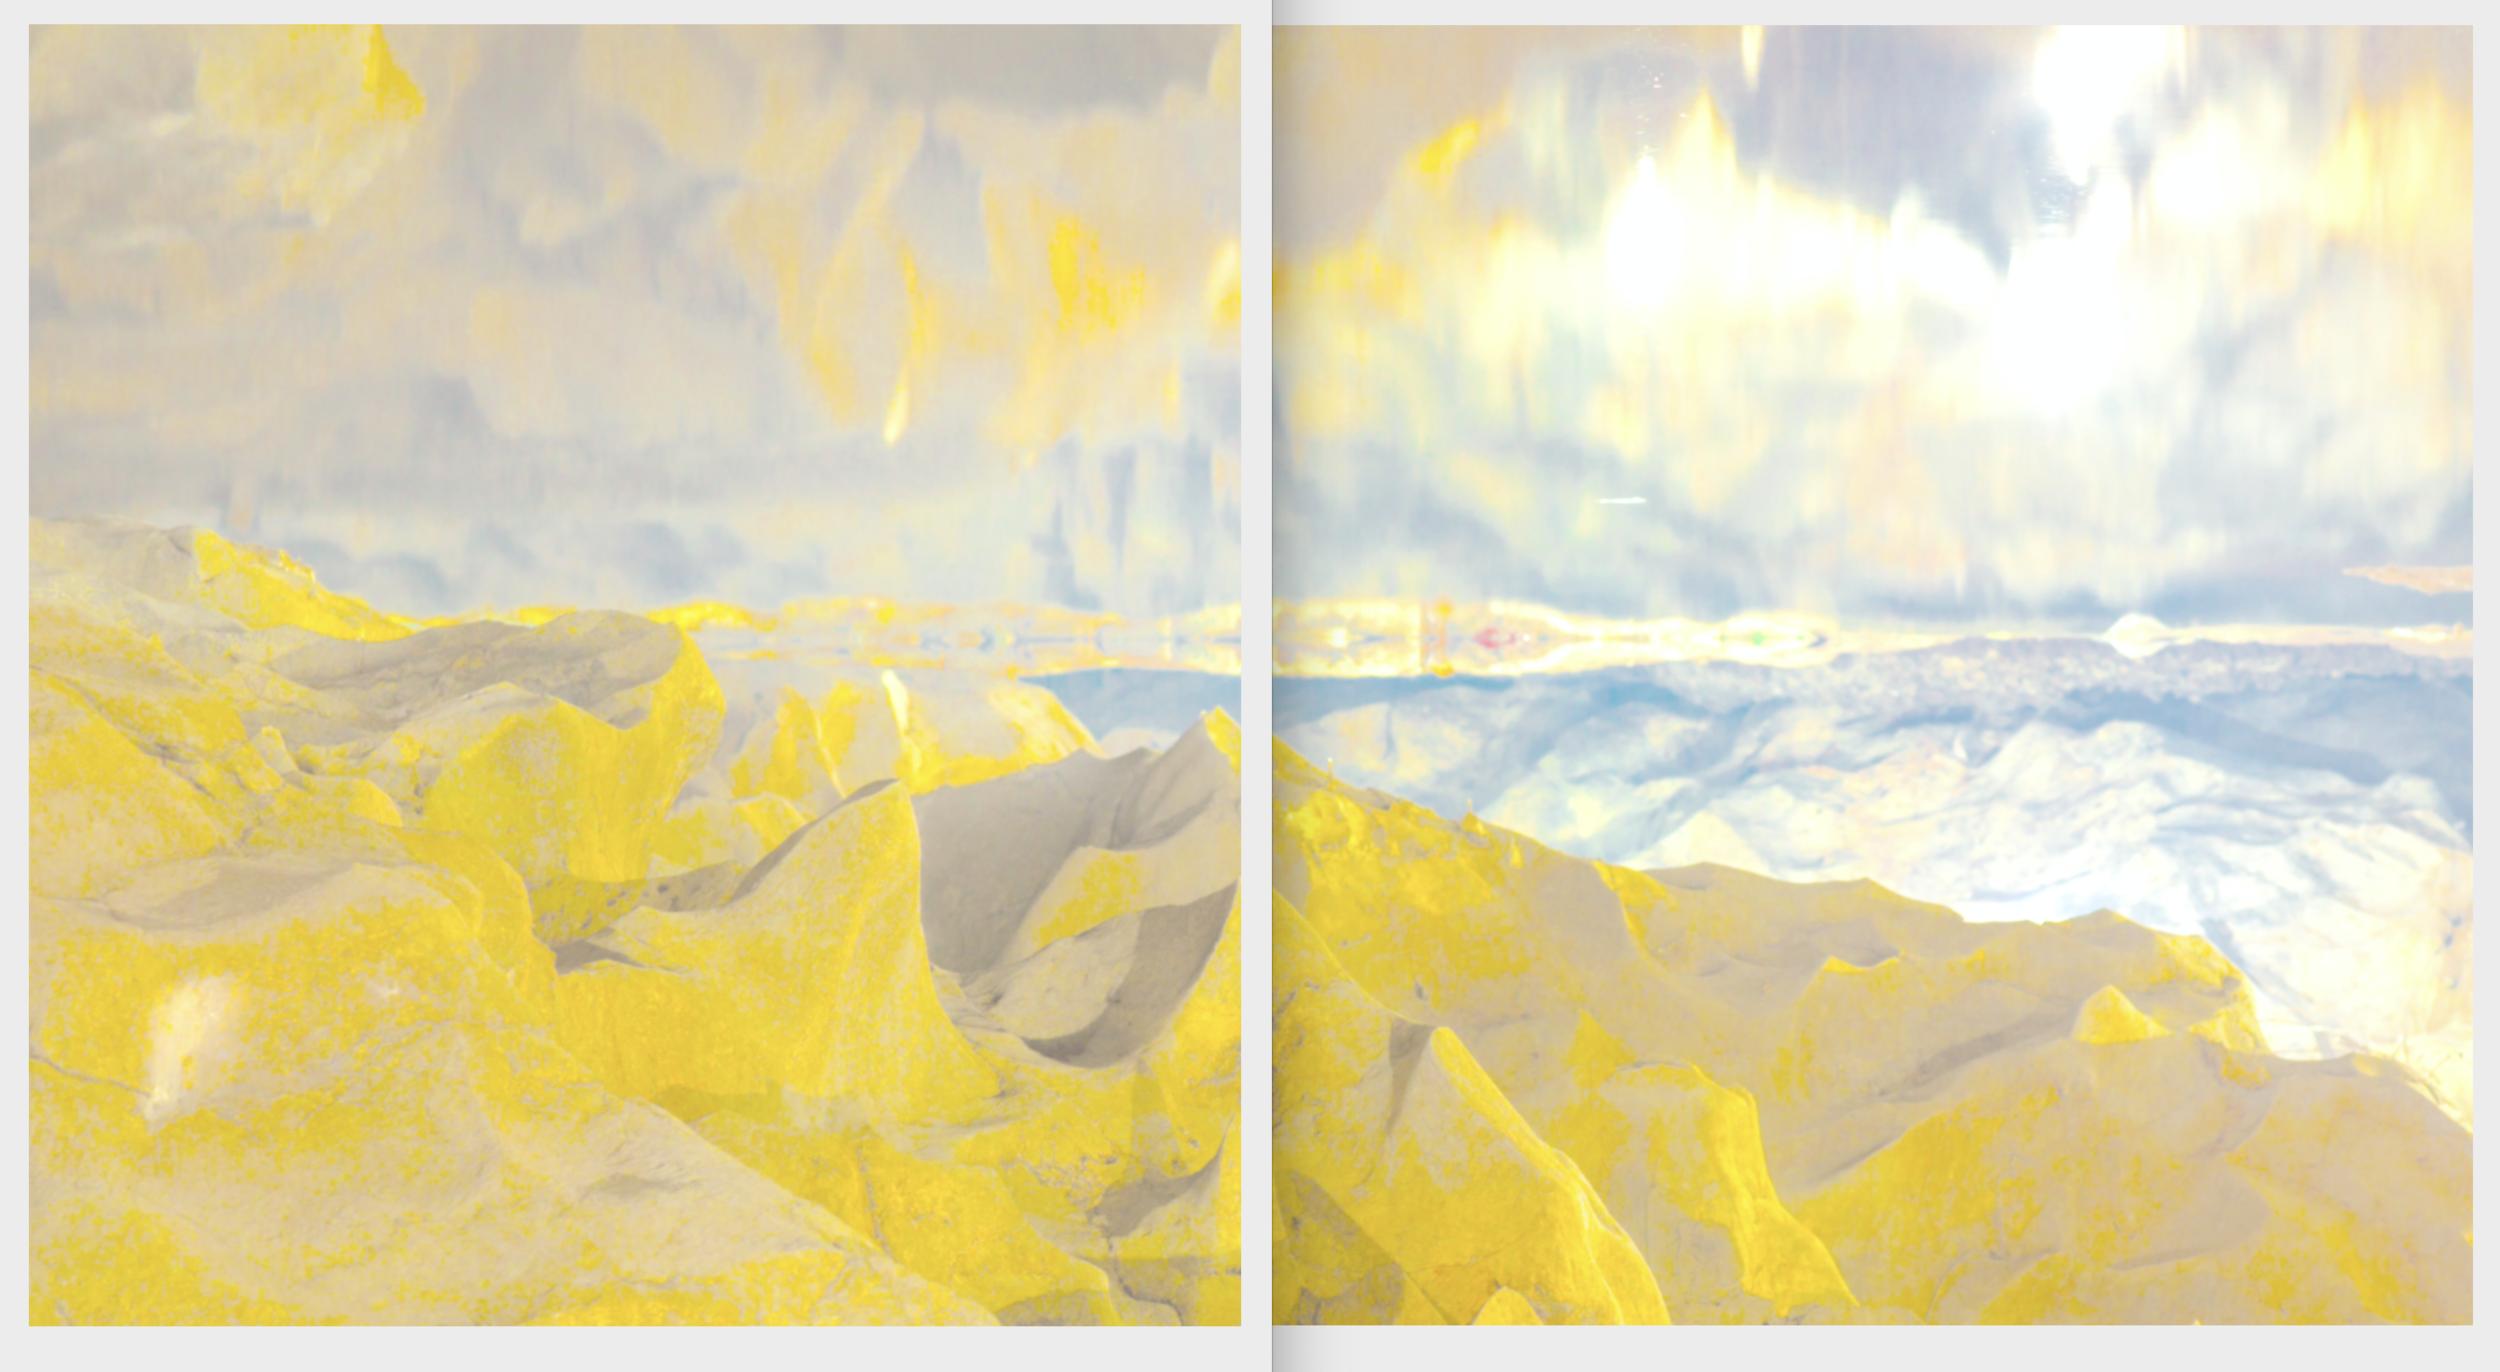 Beyond the Oecumene / Part II (Diptych),  2019 Aquarelle, wax pastels, UV-print on aluminium beneath marbled Plexiglas 300 x 160 cm (118 x 63 in)